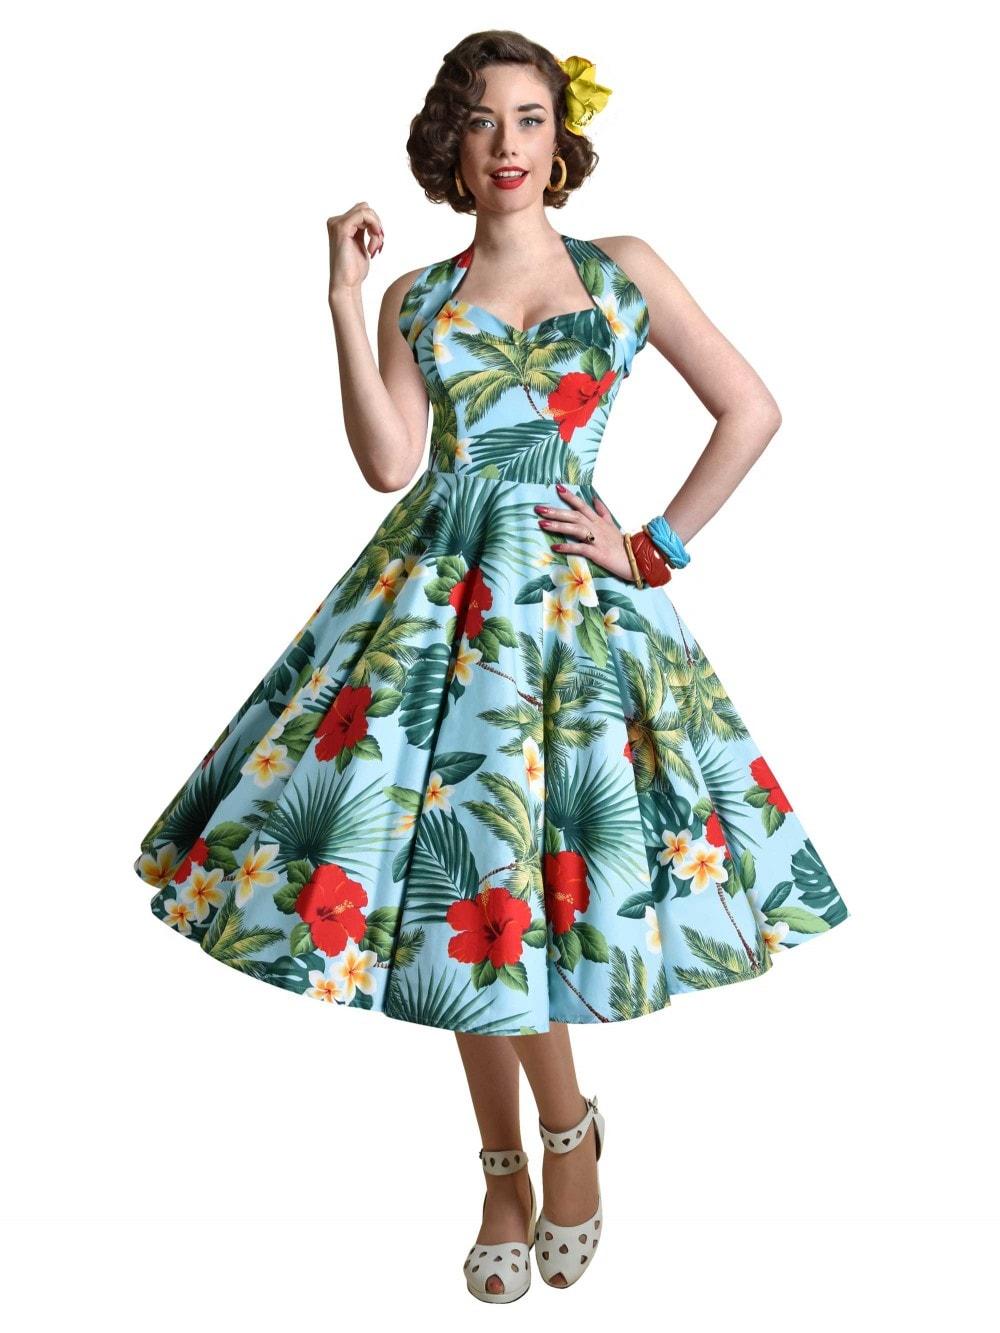 d6f4e8abfffee 1950s Halterneck Barbados Sky Dress from Vivien of Holloway